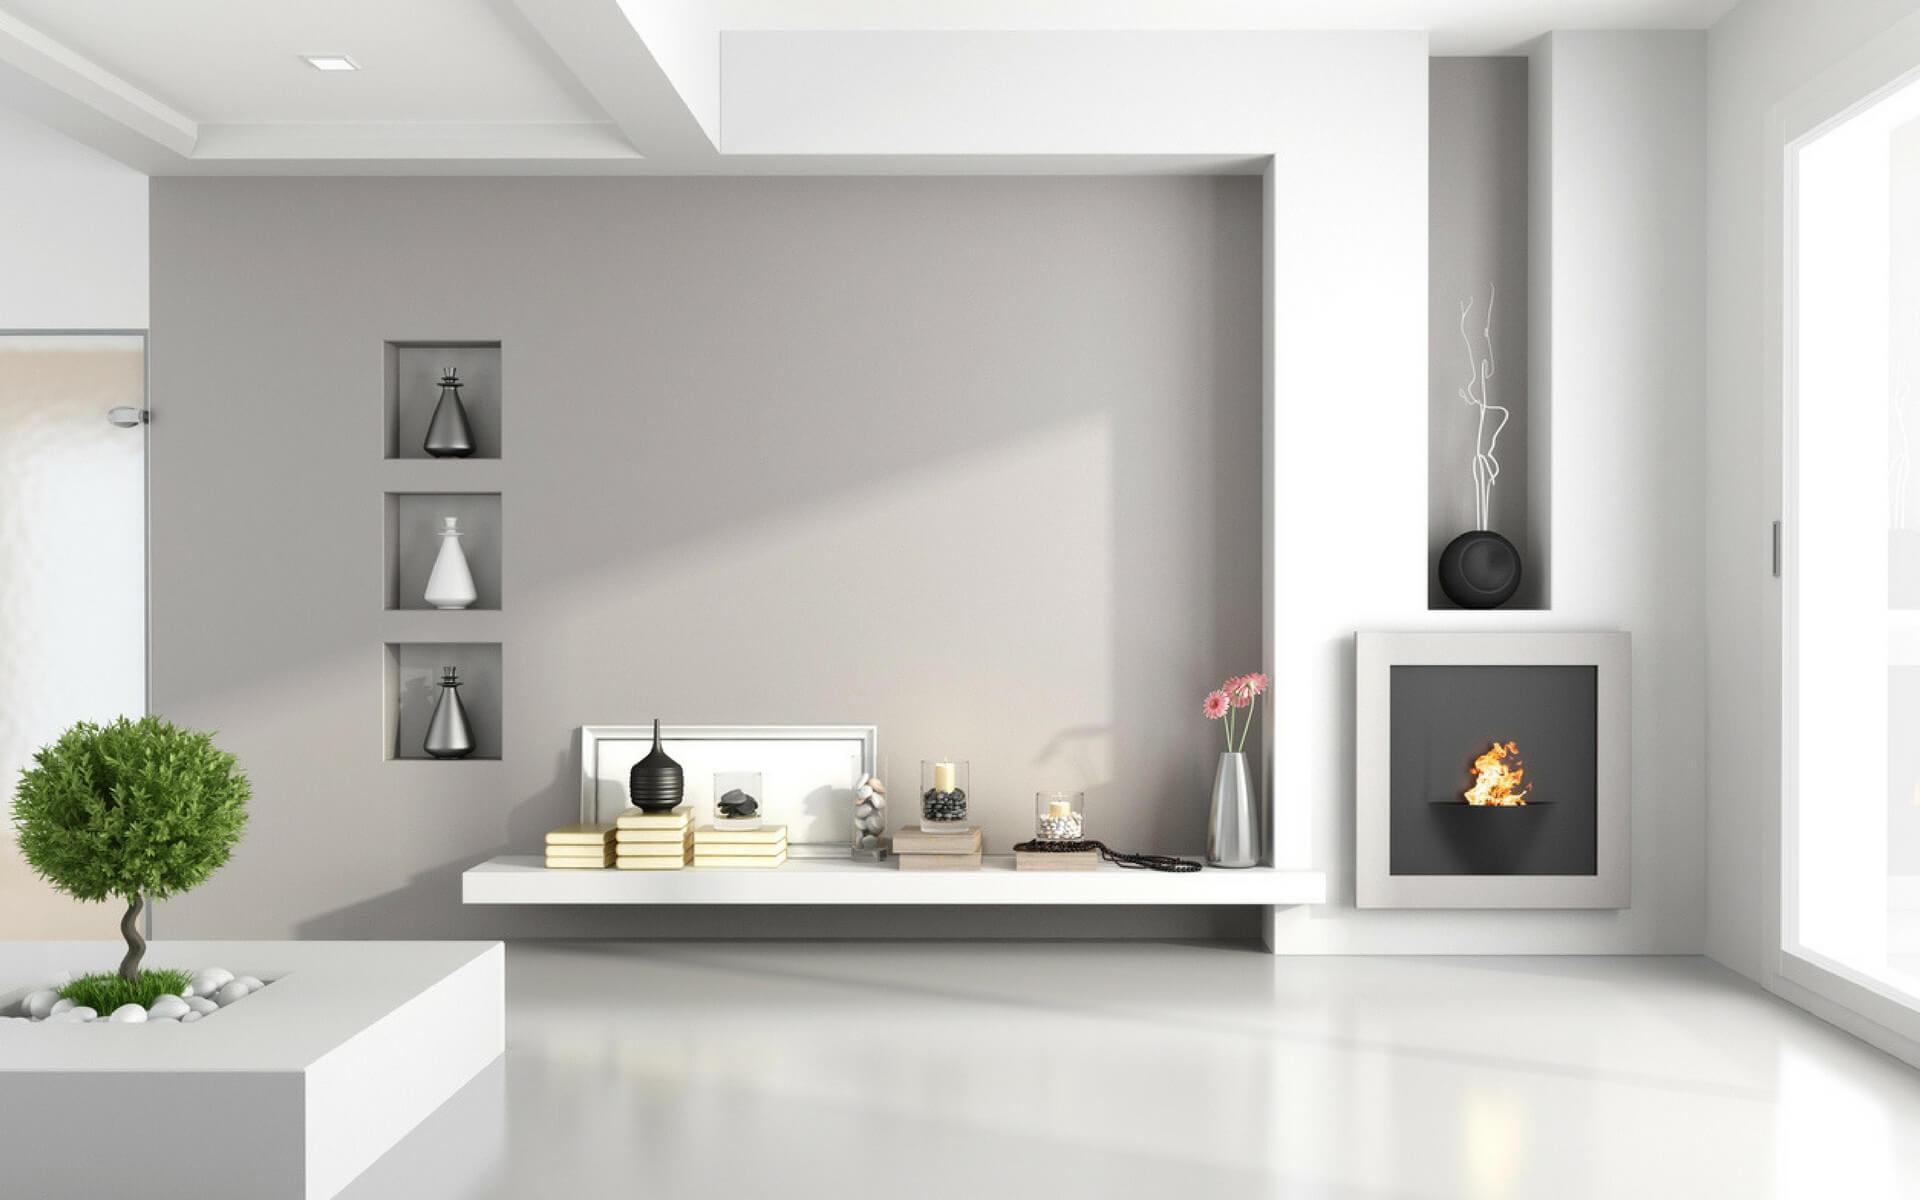 Stunning caminetti in cartongesso pareti attrezzate in for Pareti attrezzate in cartongesso foto